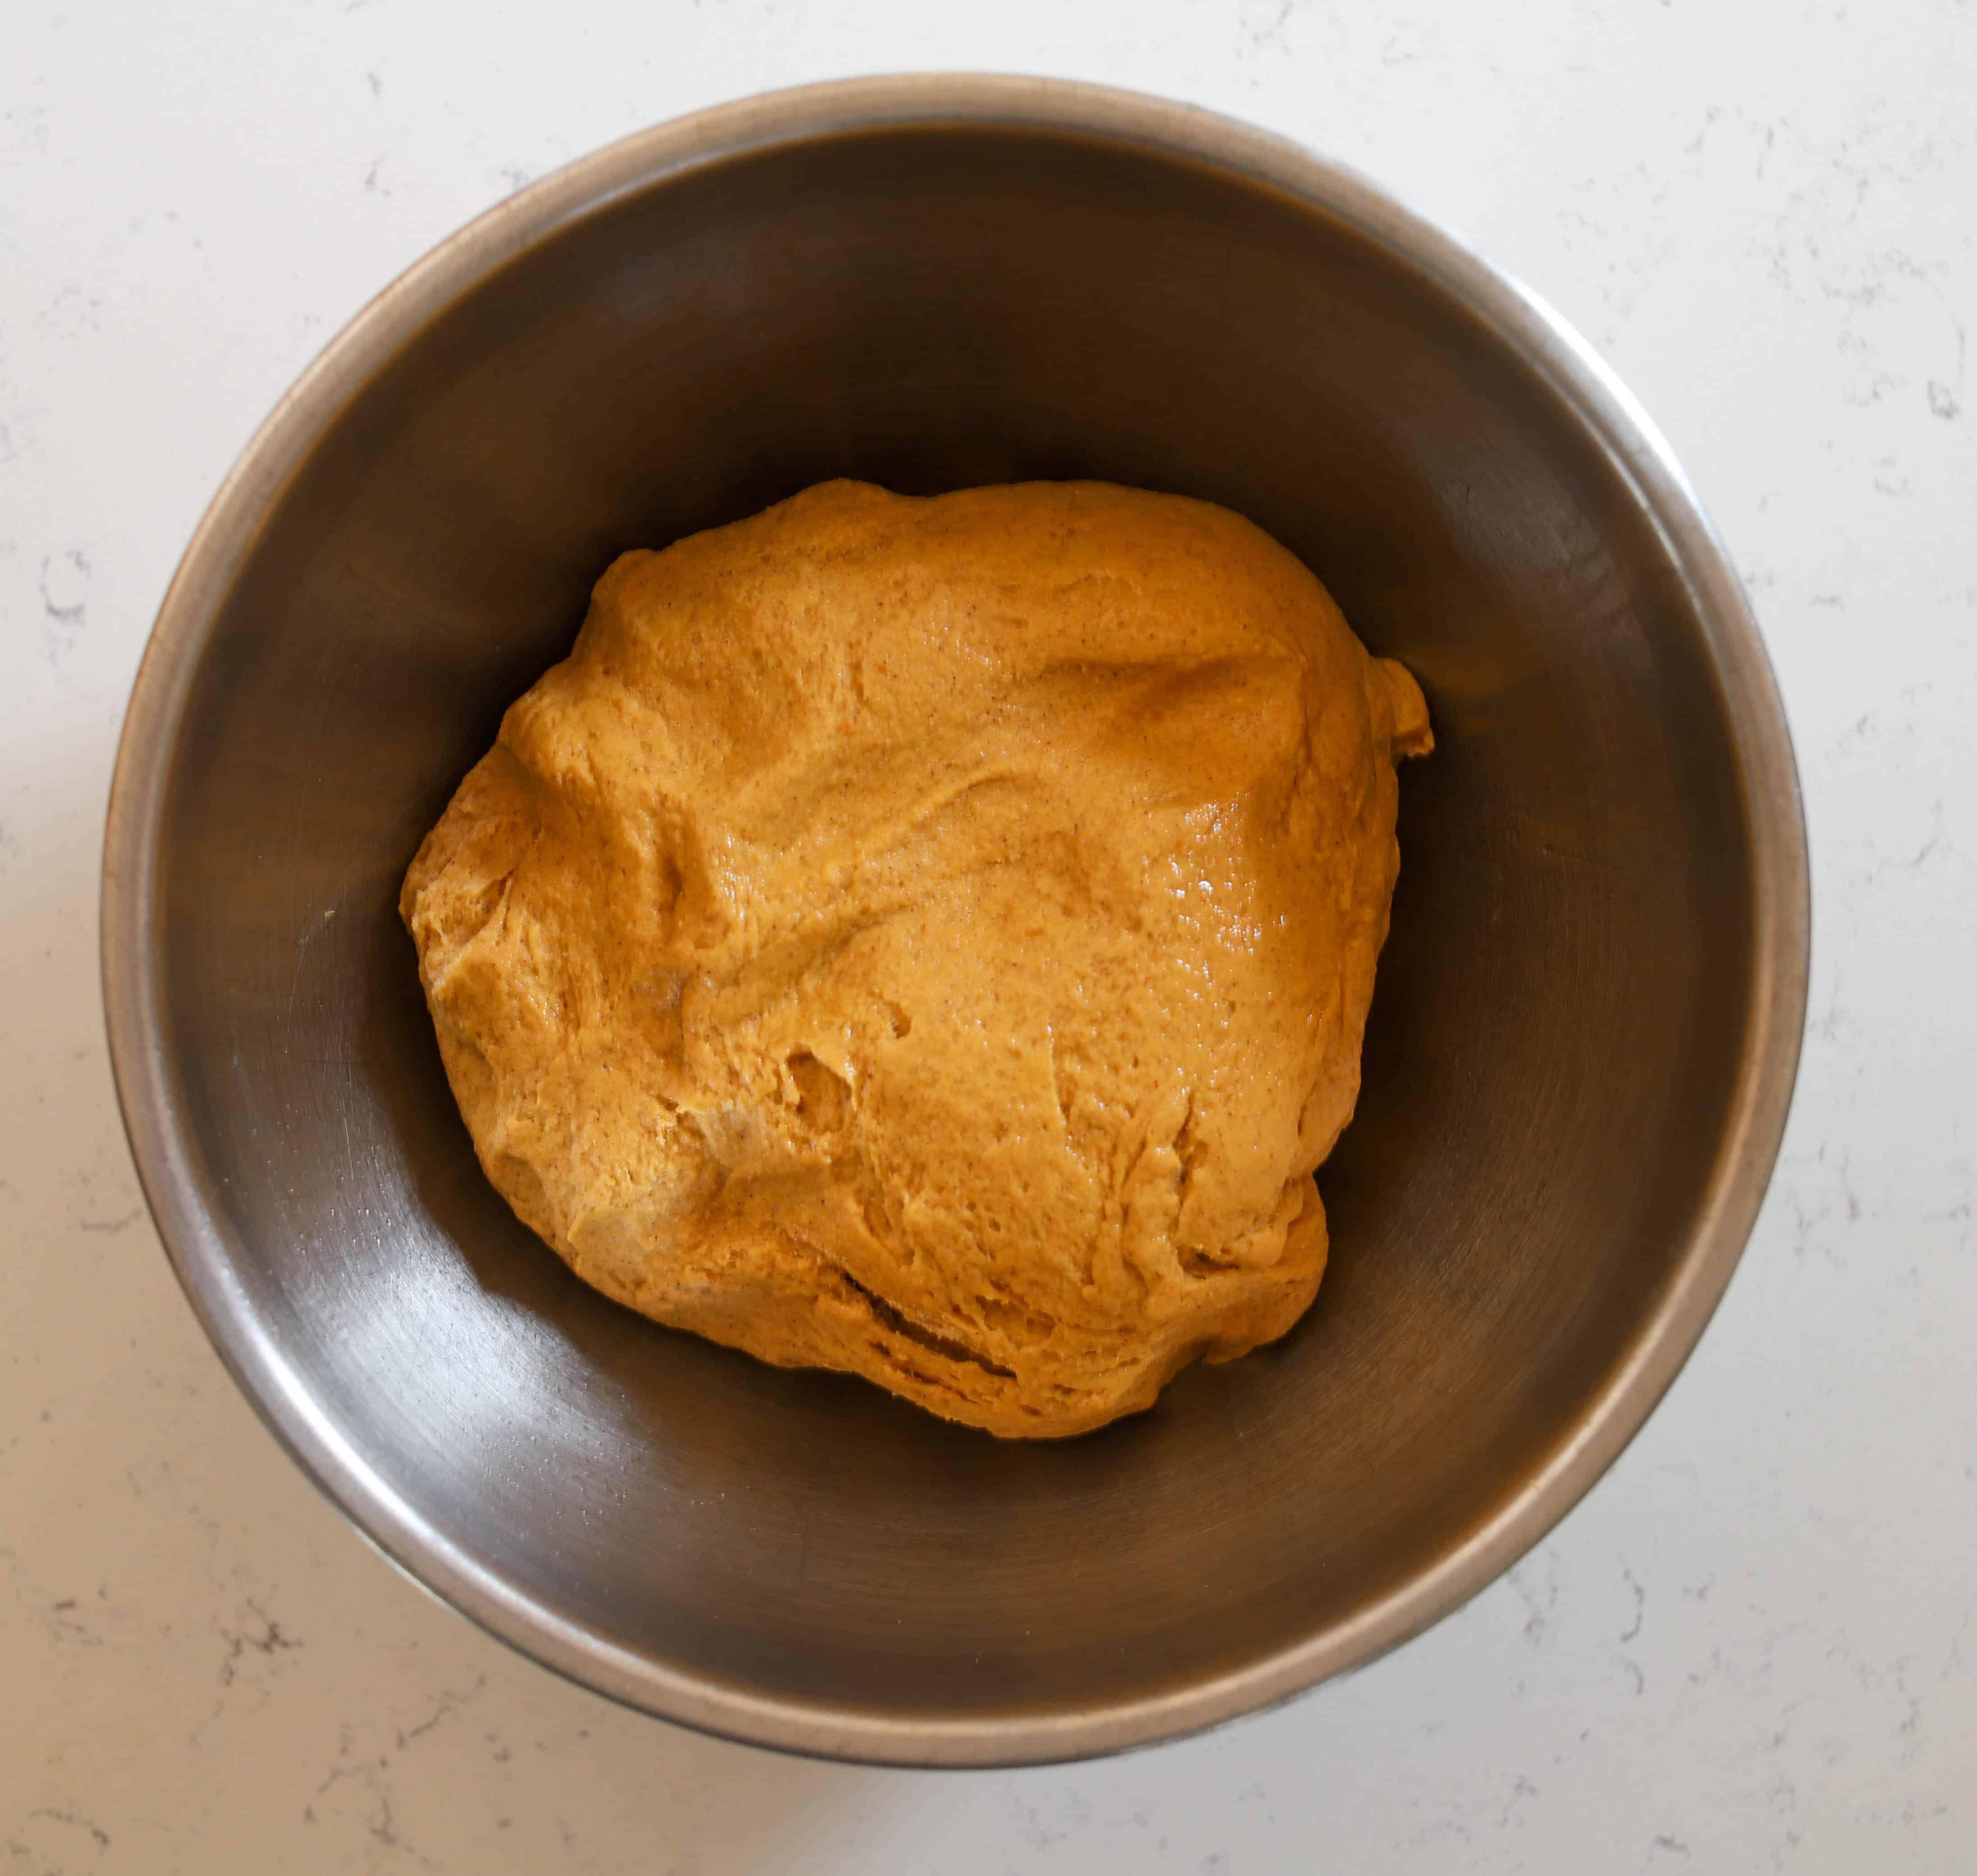 pumpkin dough in a metal bowl